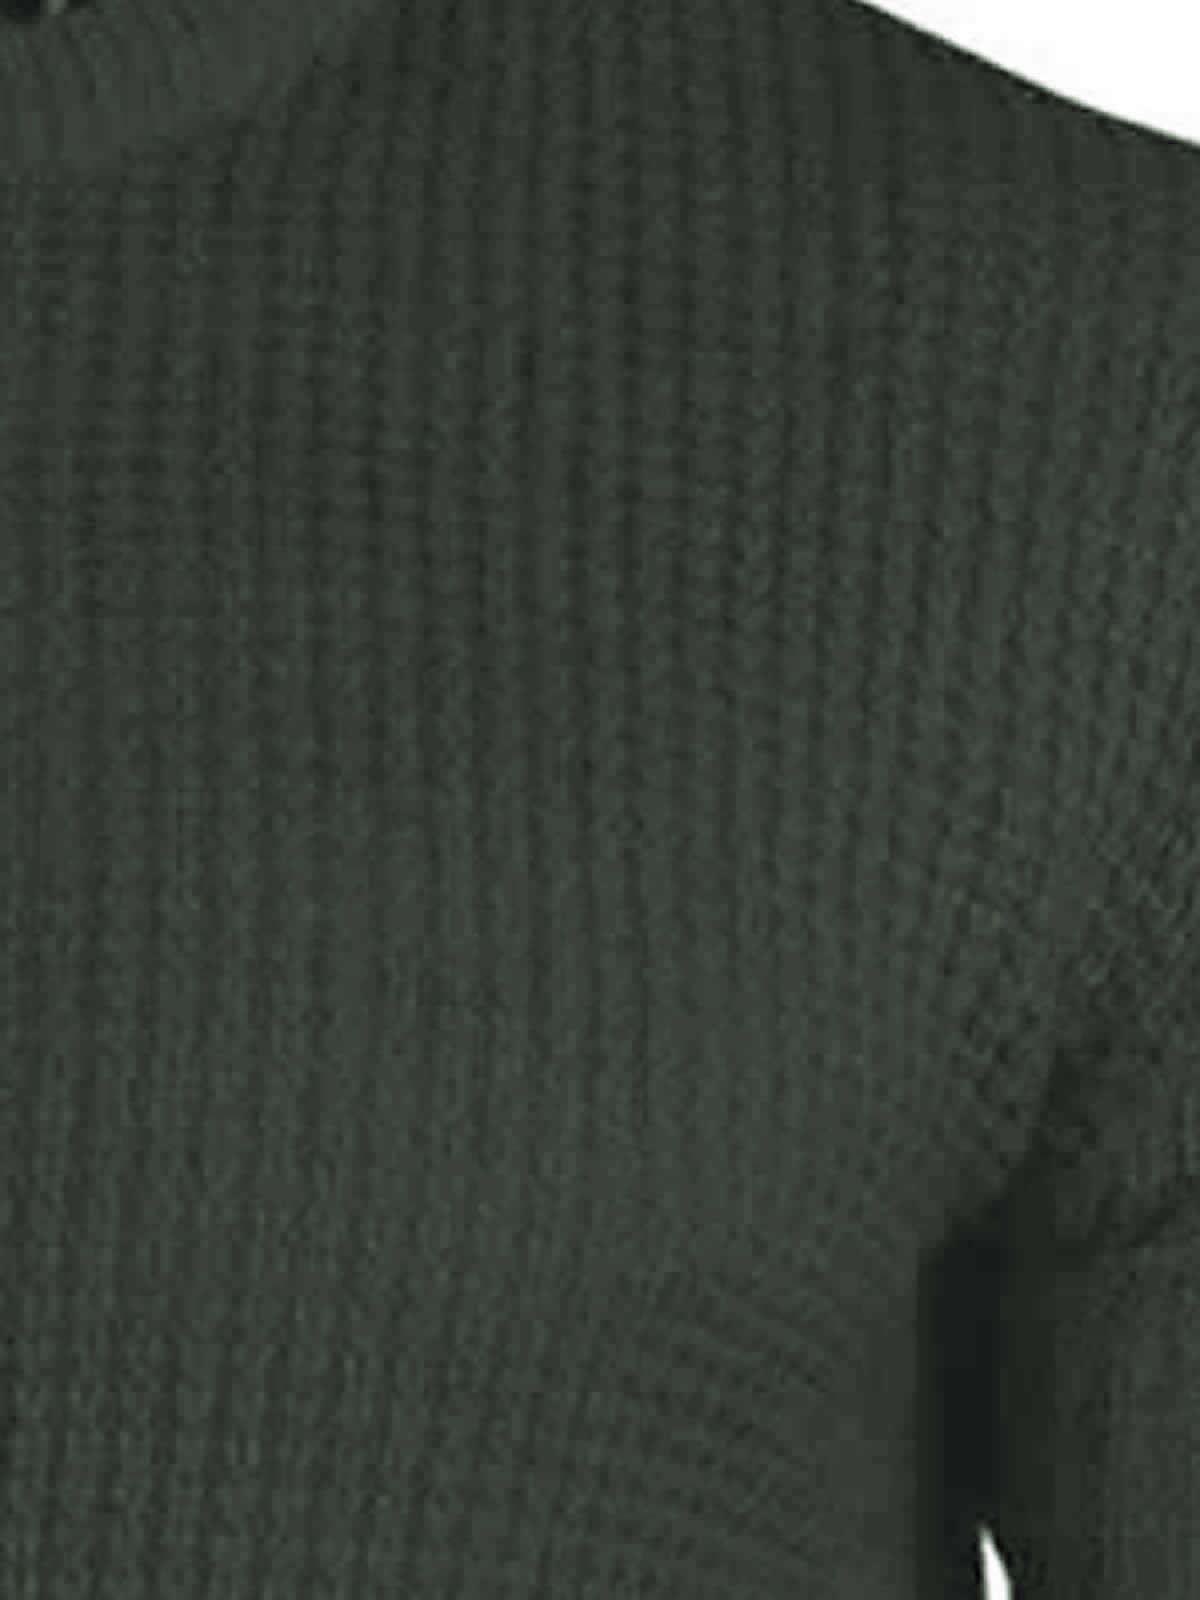 Para-hombre-Jersey-Alma-valiente-slowak-Pescador-Knit-Sueter-de-Cuello-Redondo miniatura 16